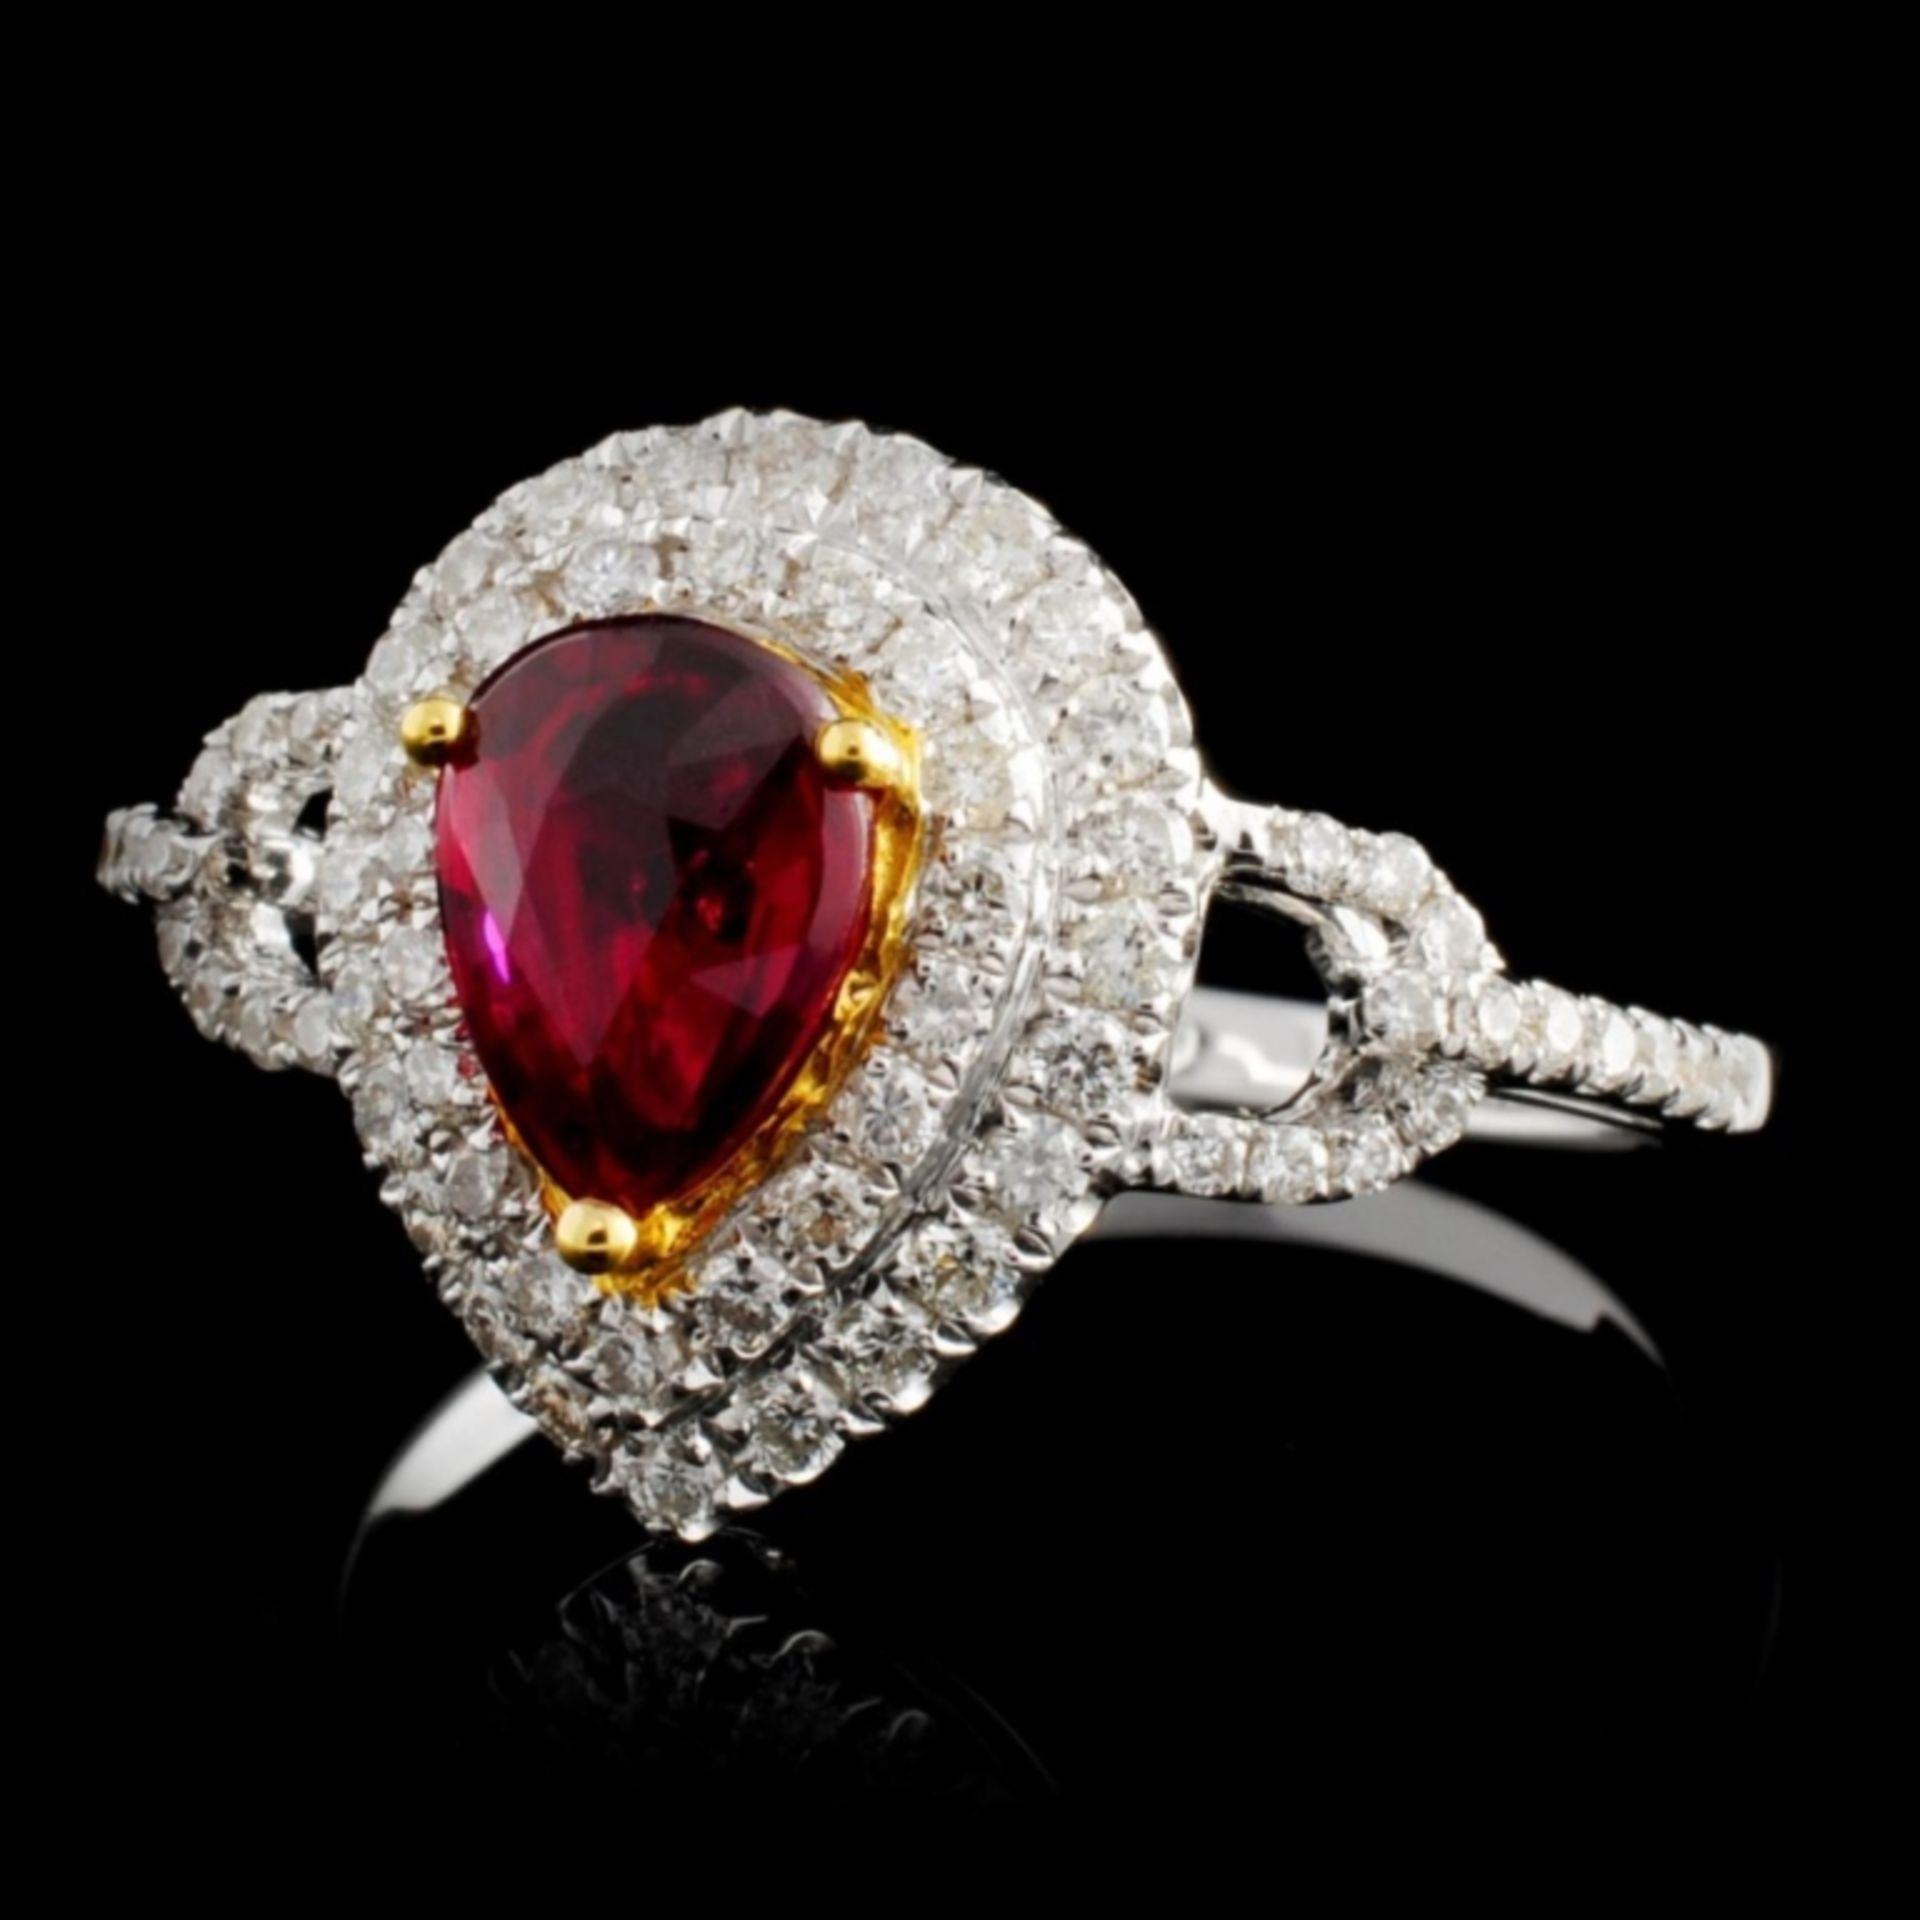 18K White Gold 0.99ct Ruby & 0.45ct Diamond Ring - Image 2 of 4